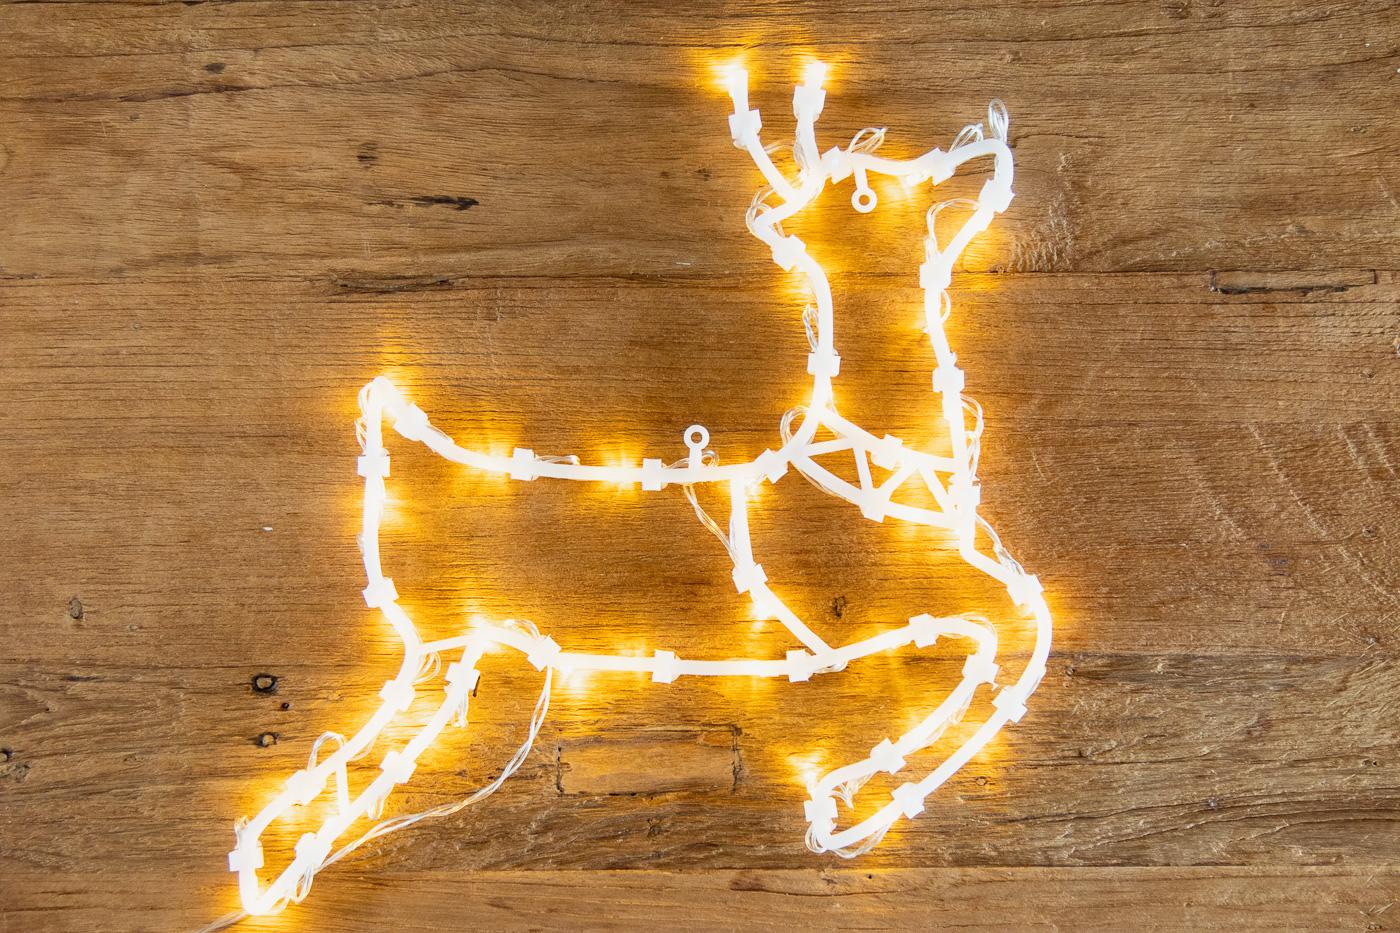 Full Size of Weihnachtsbeleuchtung Fenster Innen Hornbach Bunt Mit Kabel Kabellos Batteriebetrieben Pyramide Led Silhouette Rentier Christbaum Beleuchtungde Beleuchtung Fenster Weihnachtsbeleuchtung Fenster